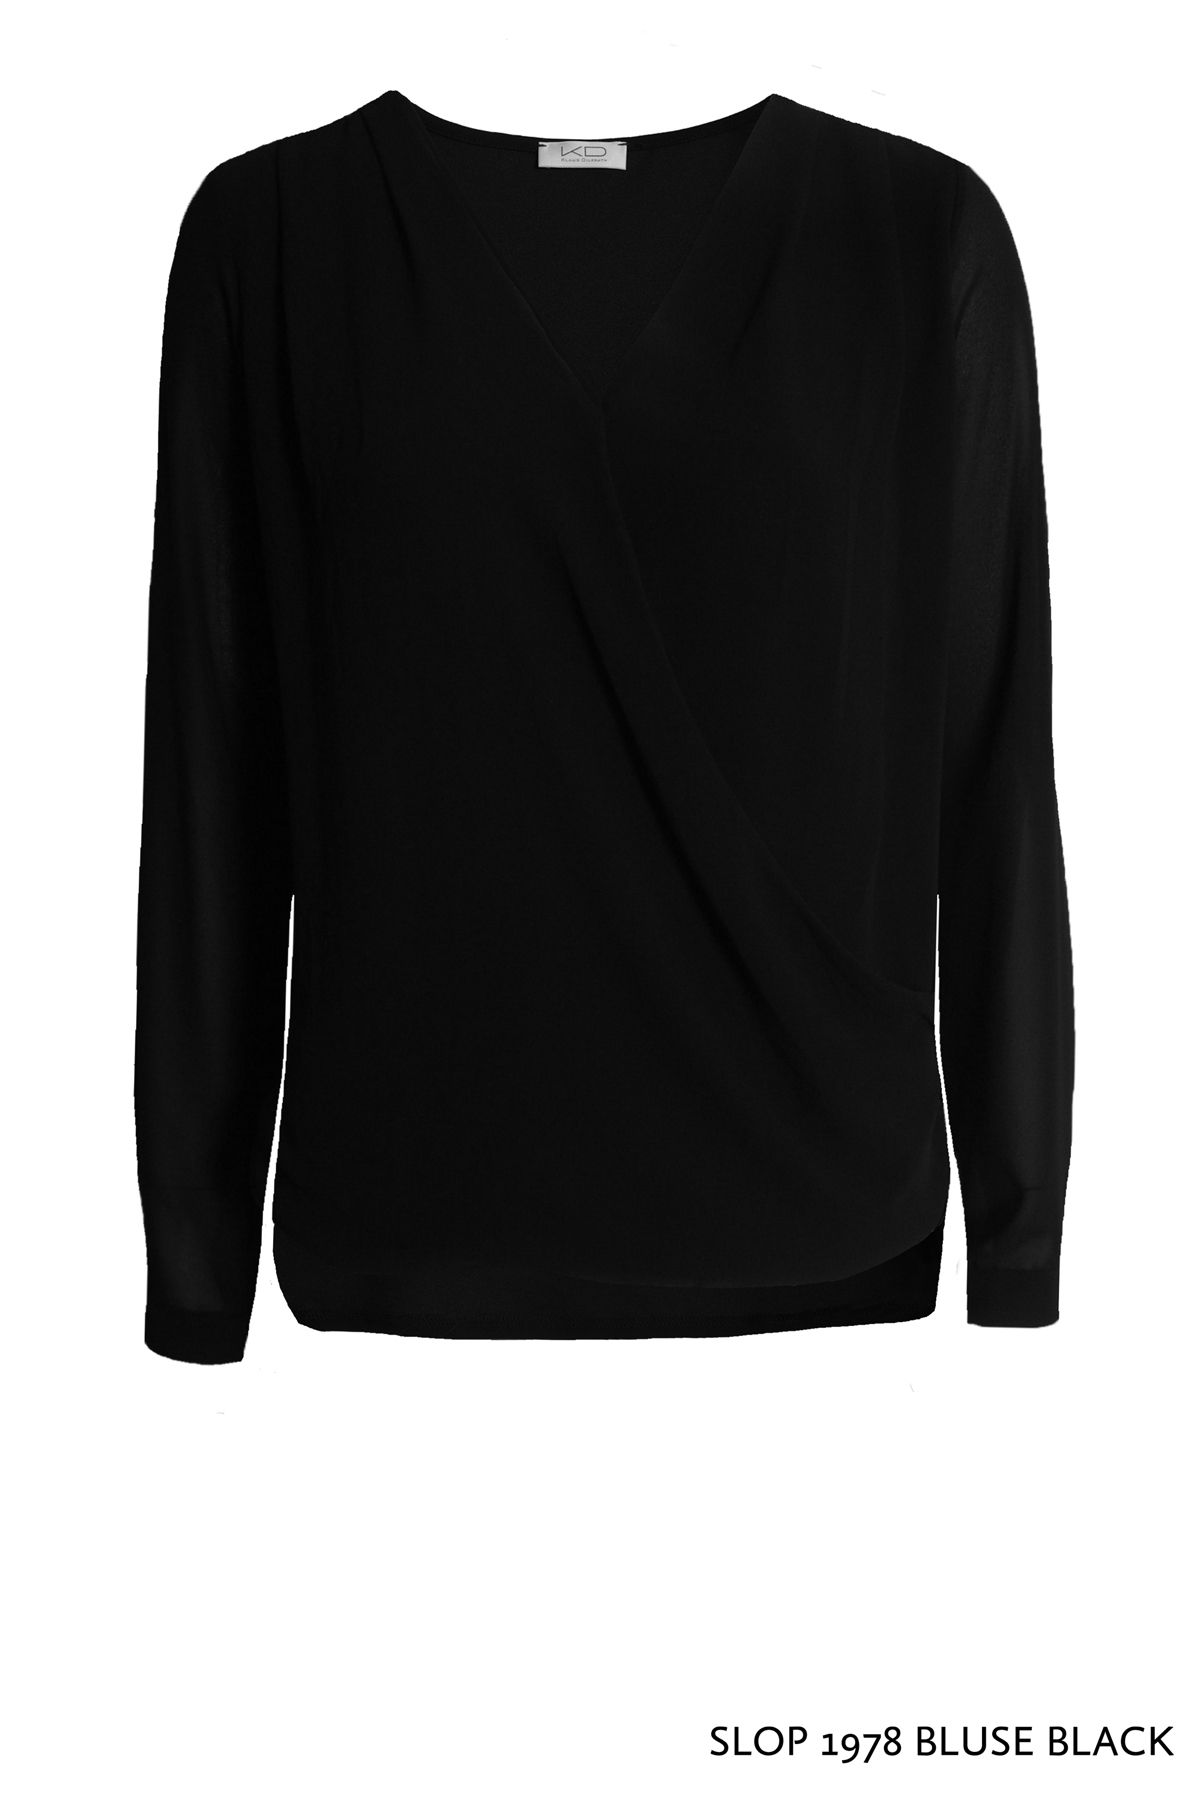 Slop 1978 Bluse Black von KD Klaus Dilkrath #kdklausdilkrath #slop #blouse #black #party #newyearseve #shirt #kdklausdilkrath #kd #dilkrath #kd12 #outfit